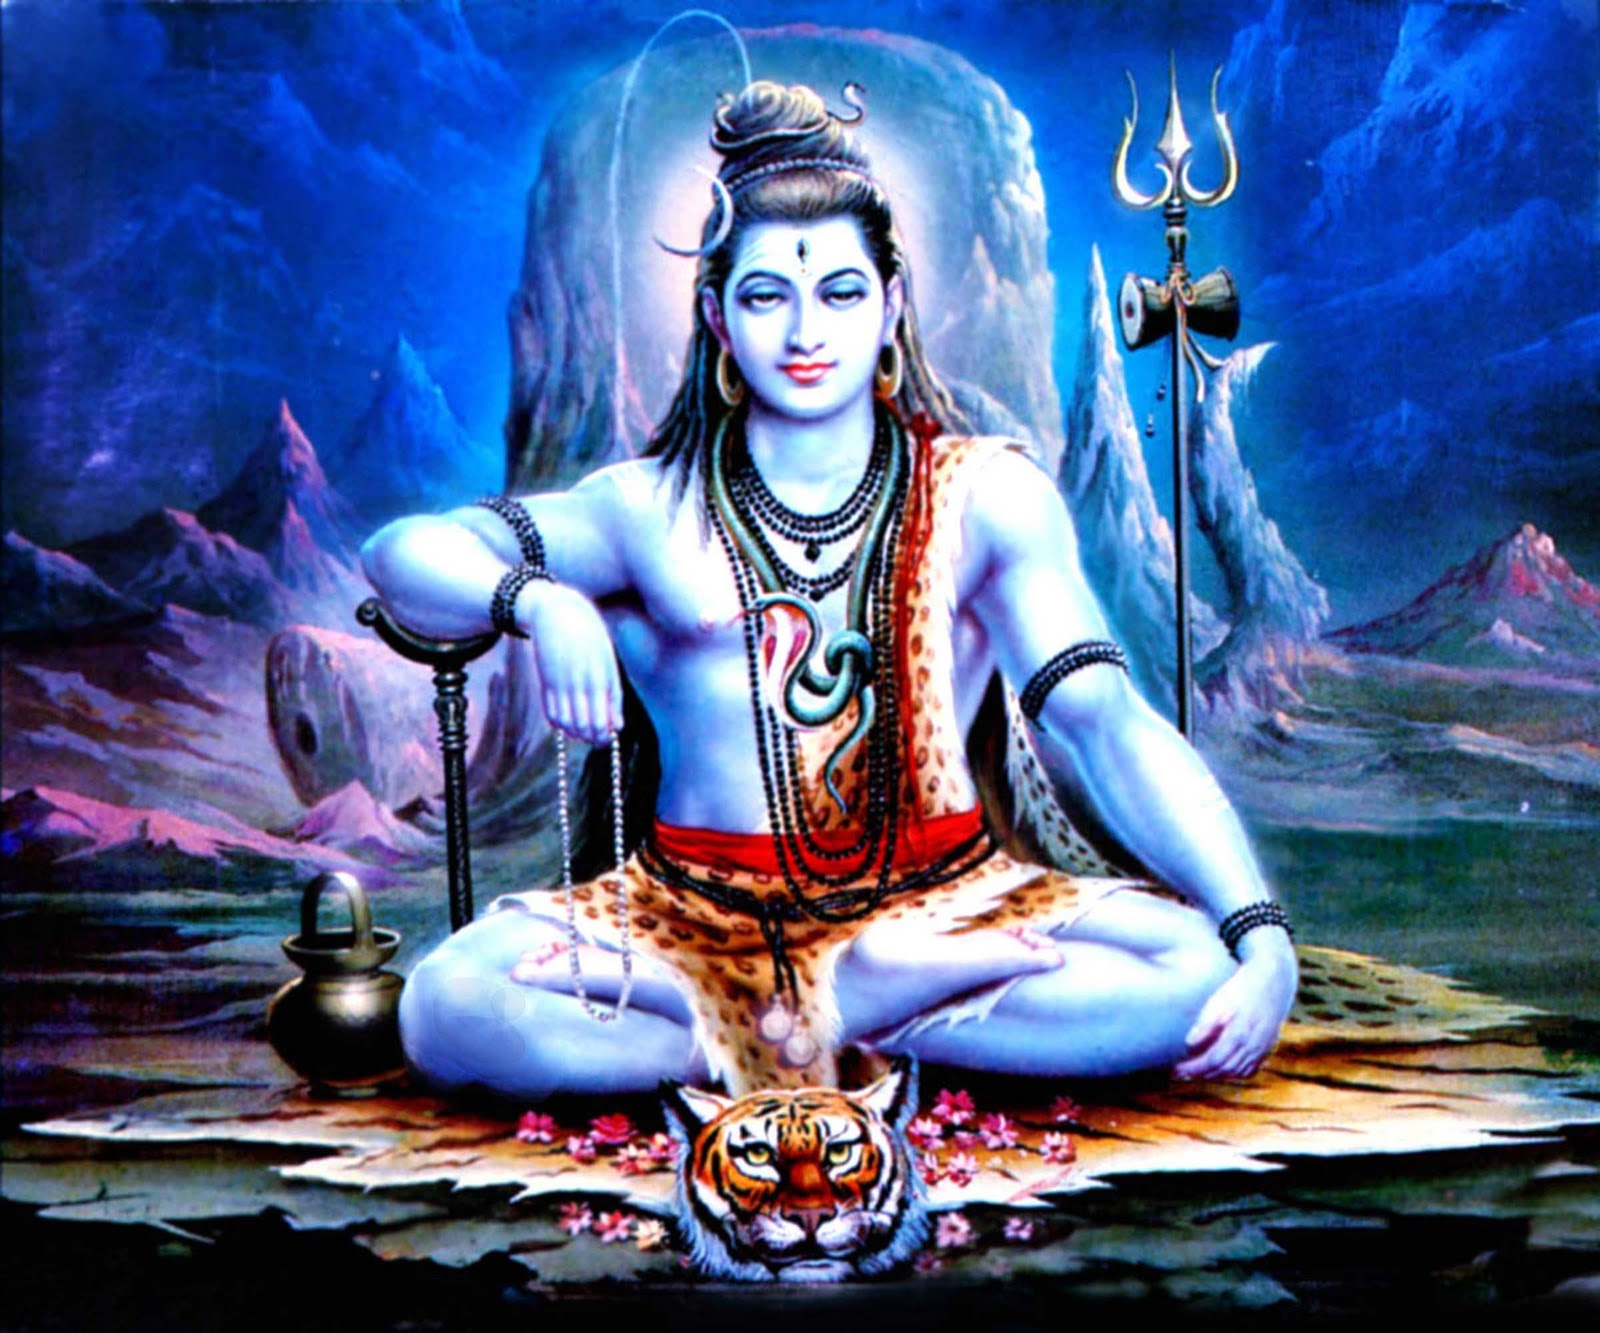 hindu god photosgods wallpapershindu gods wallpaper for desktopgods 1600x1333